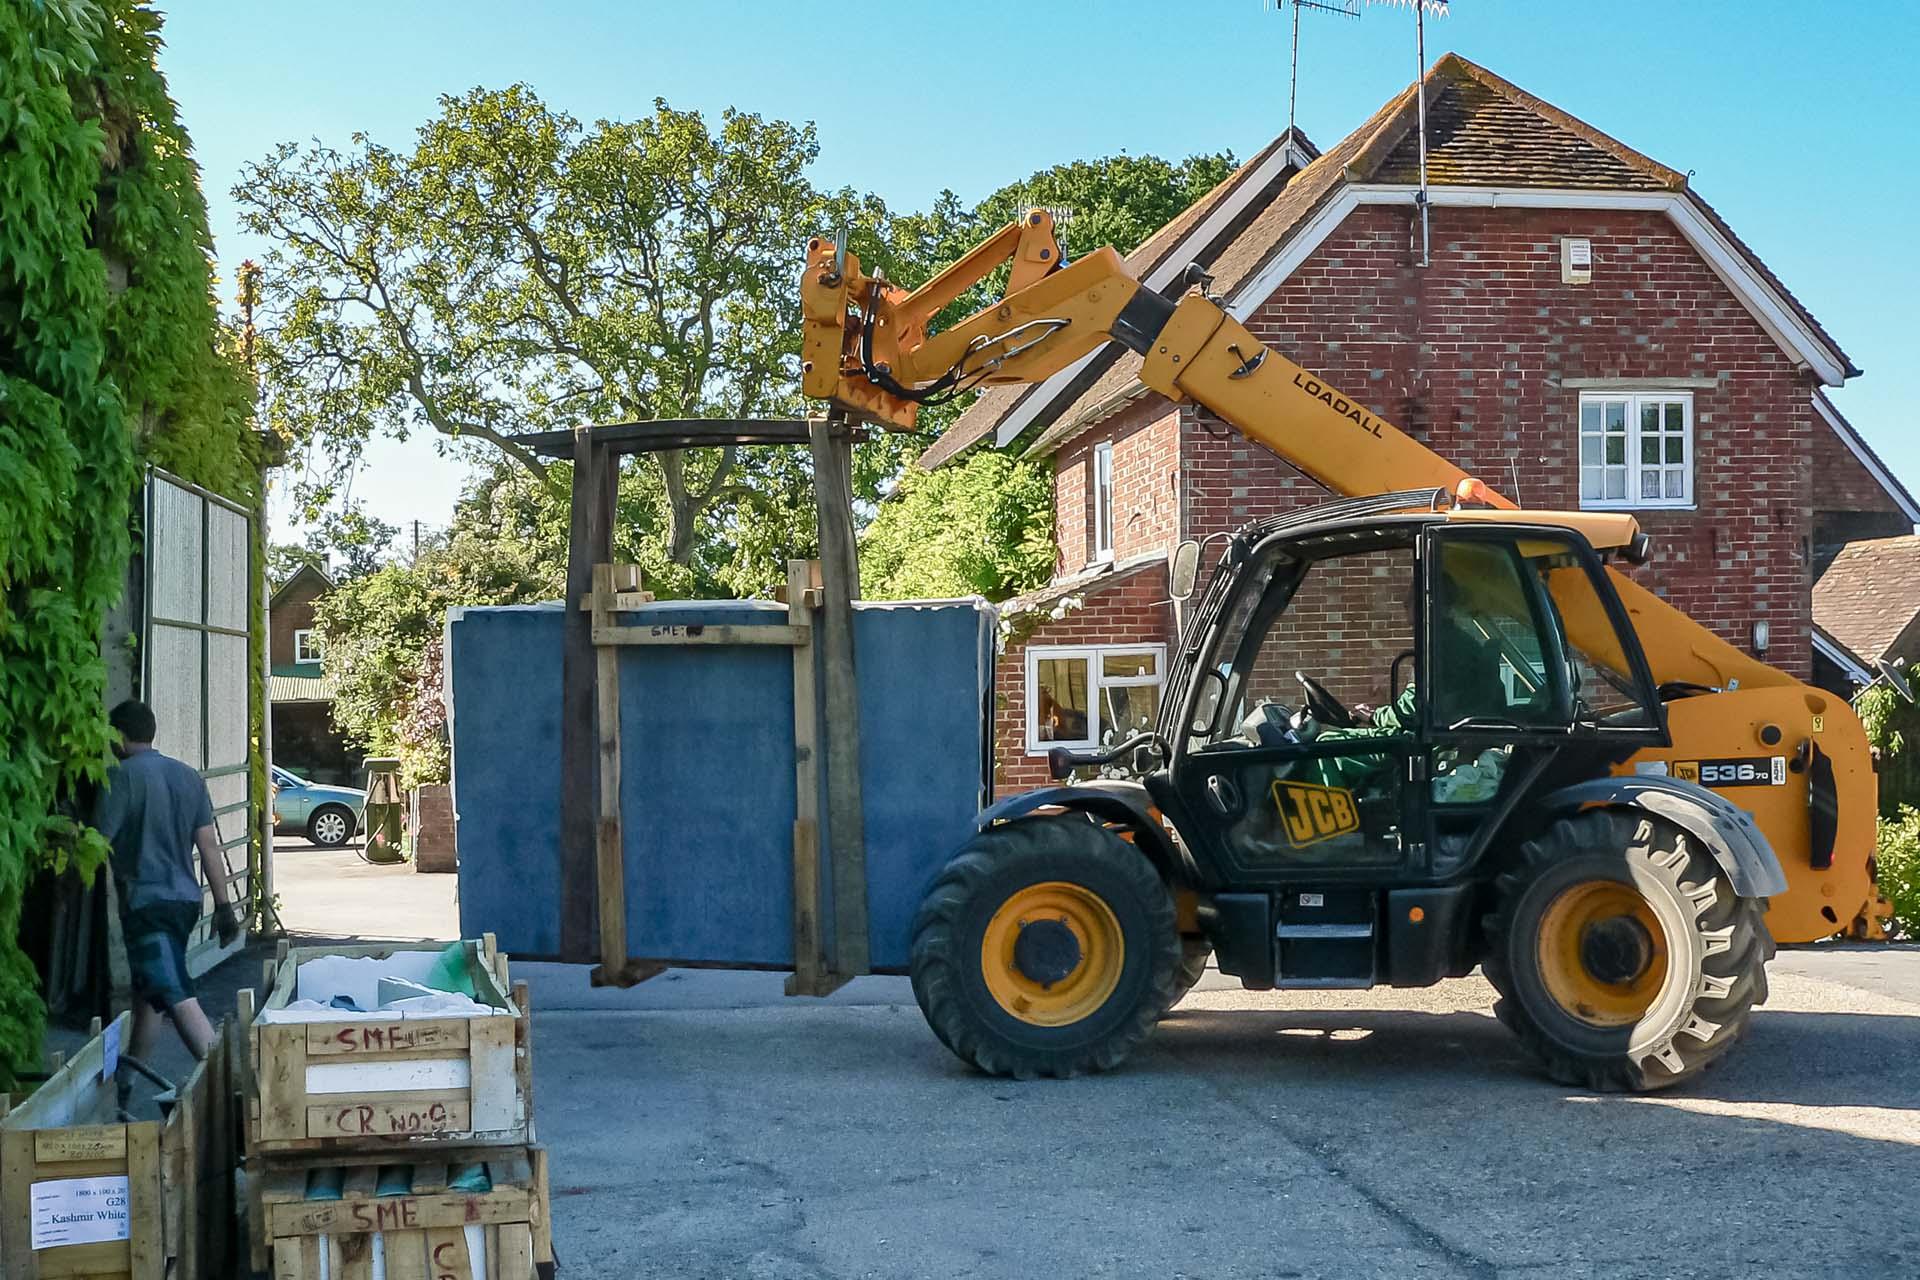 granite worktop prices quotation islands on jcb wortktops in crates Redhill granite